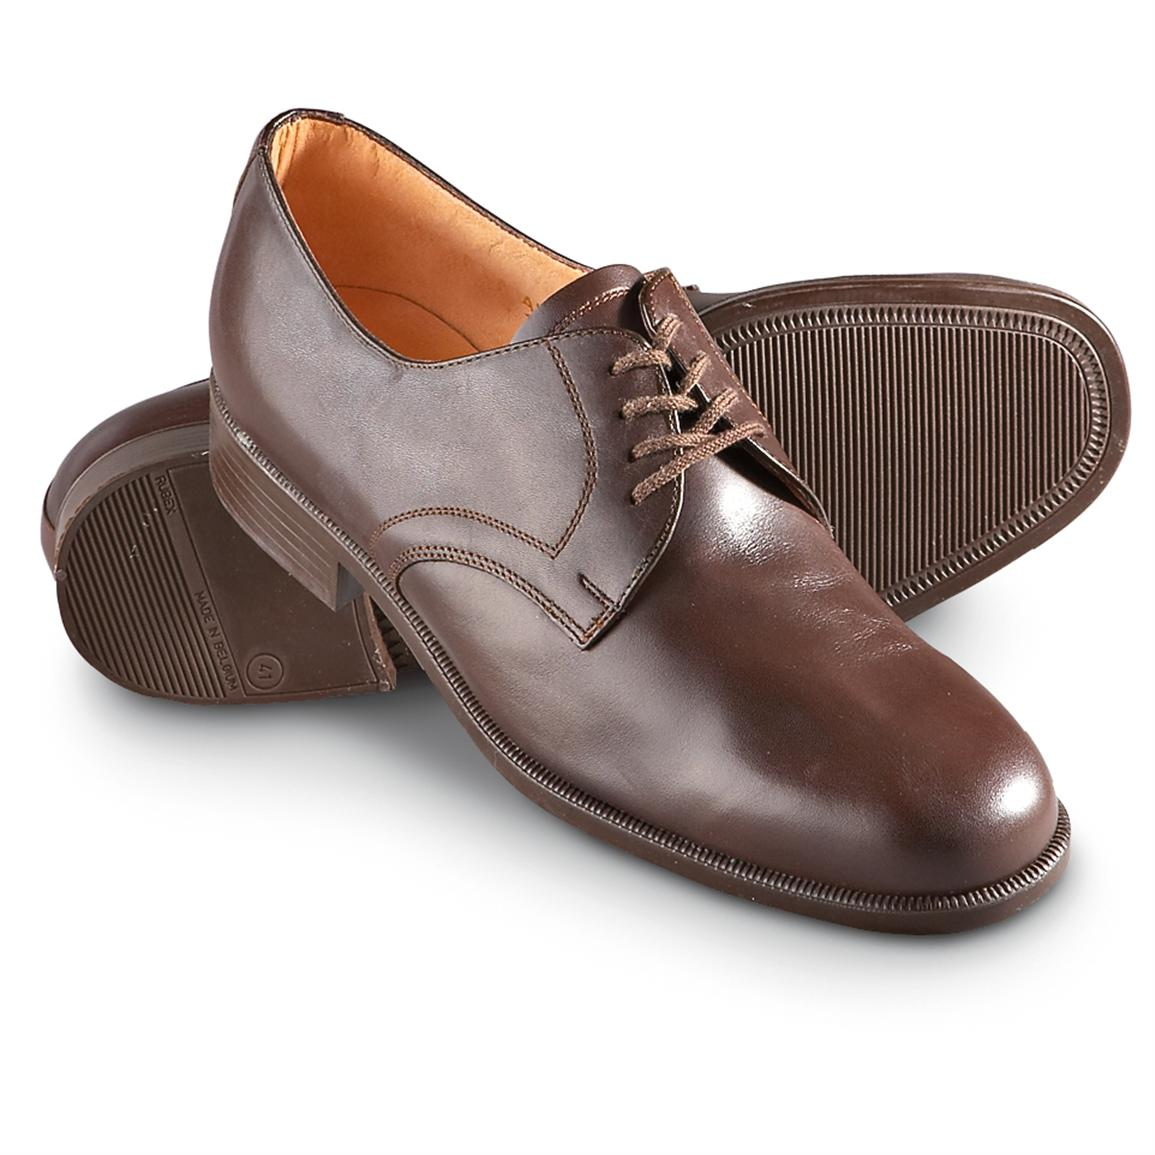 В качестве обуви в стиле милитари в зависимости от времени года подойдут сапоги, ботинки на толстой подошве, туфли